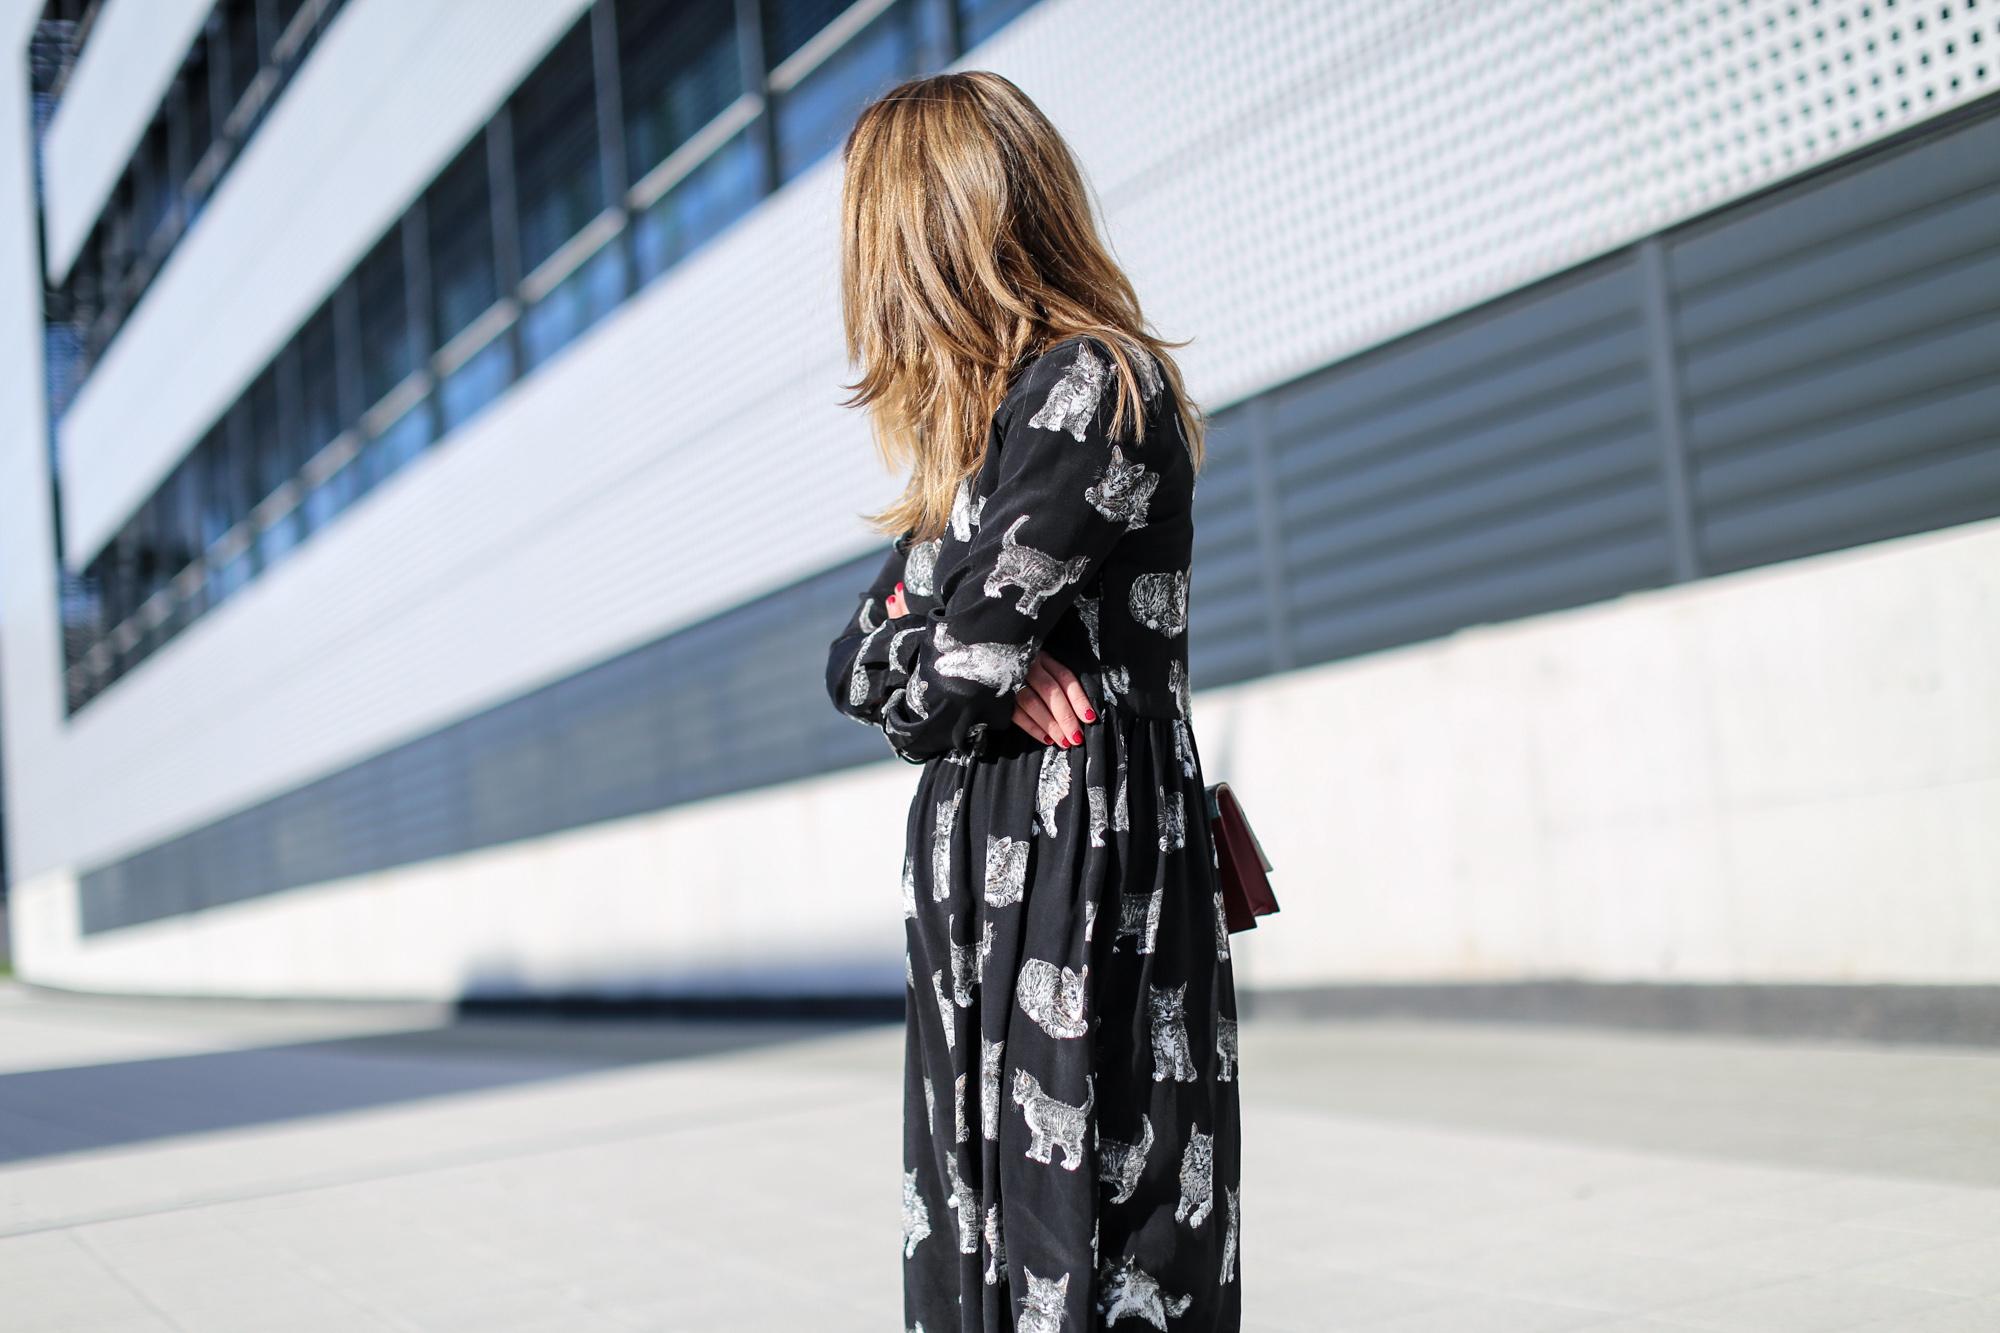 Clochet_fashionblogger_streetstyle_zaracatsprintdmididress_coslongwoolcoat_adidasgazelle_titamadridspiga-6